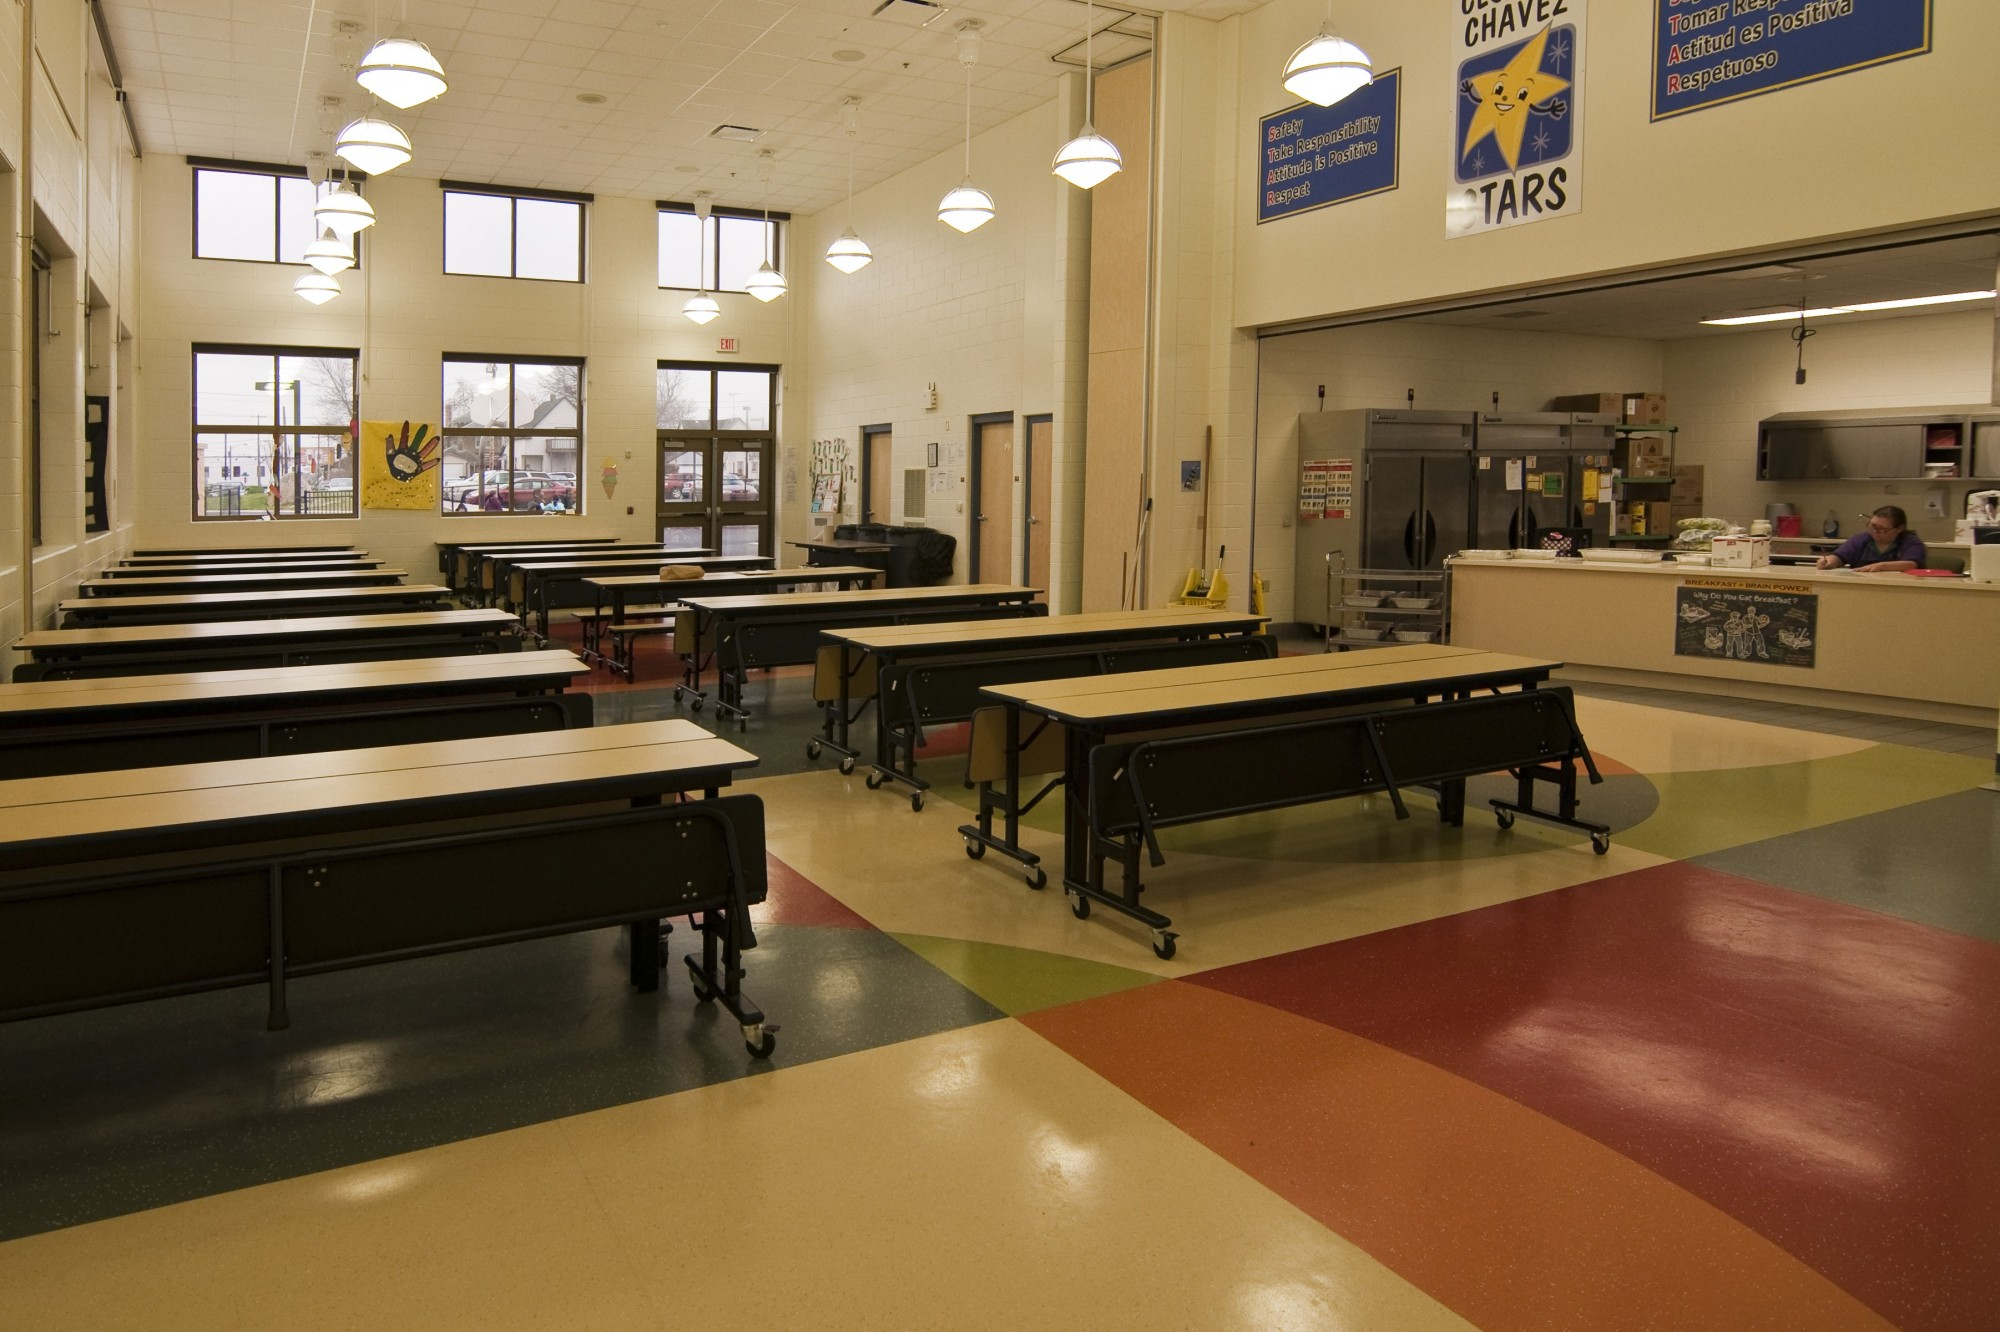 Cesar E Chavez Elementary School Cafeteria Furniture City History 2000x1332